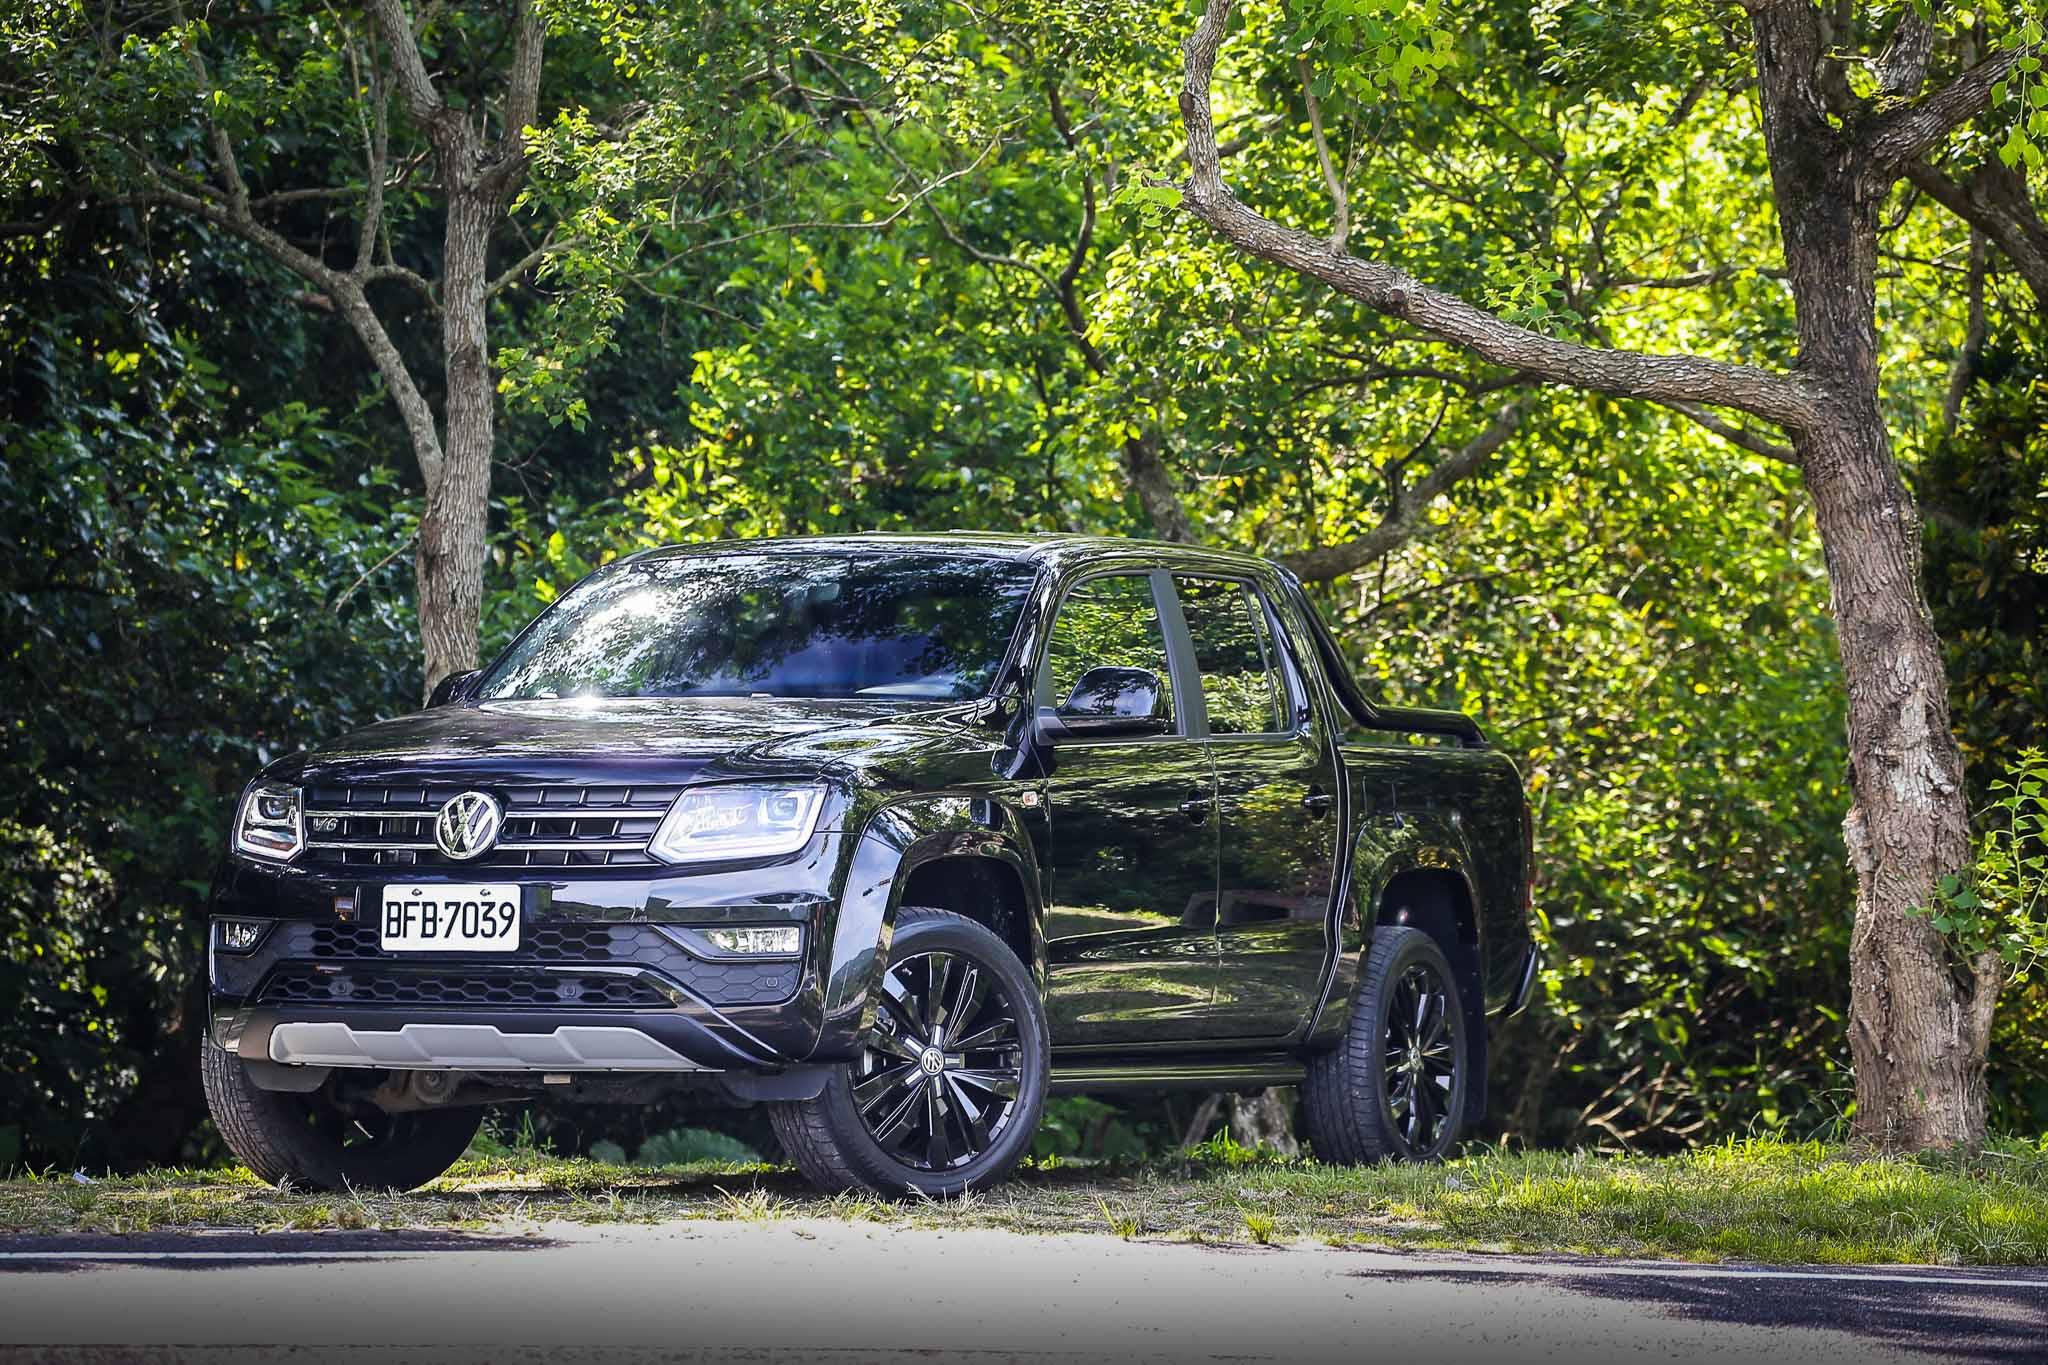 VWCV Amarok V6 Black Edition 售價新台幣 172.8 萬元,限量 30 輛。